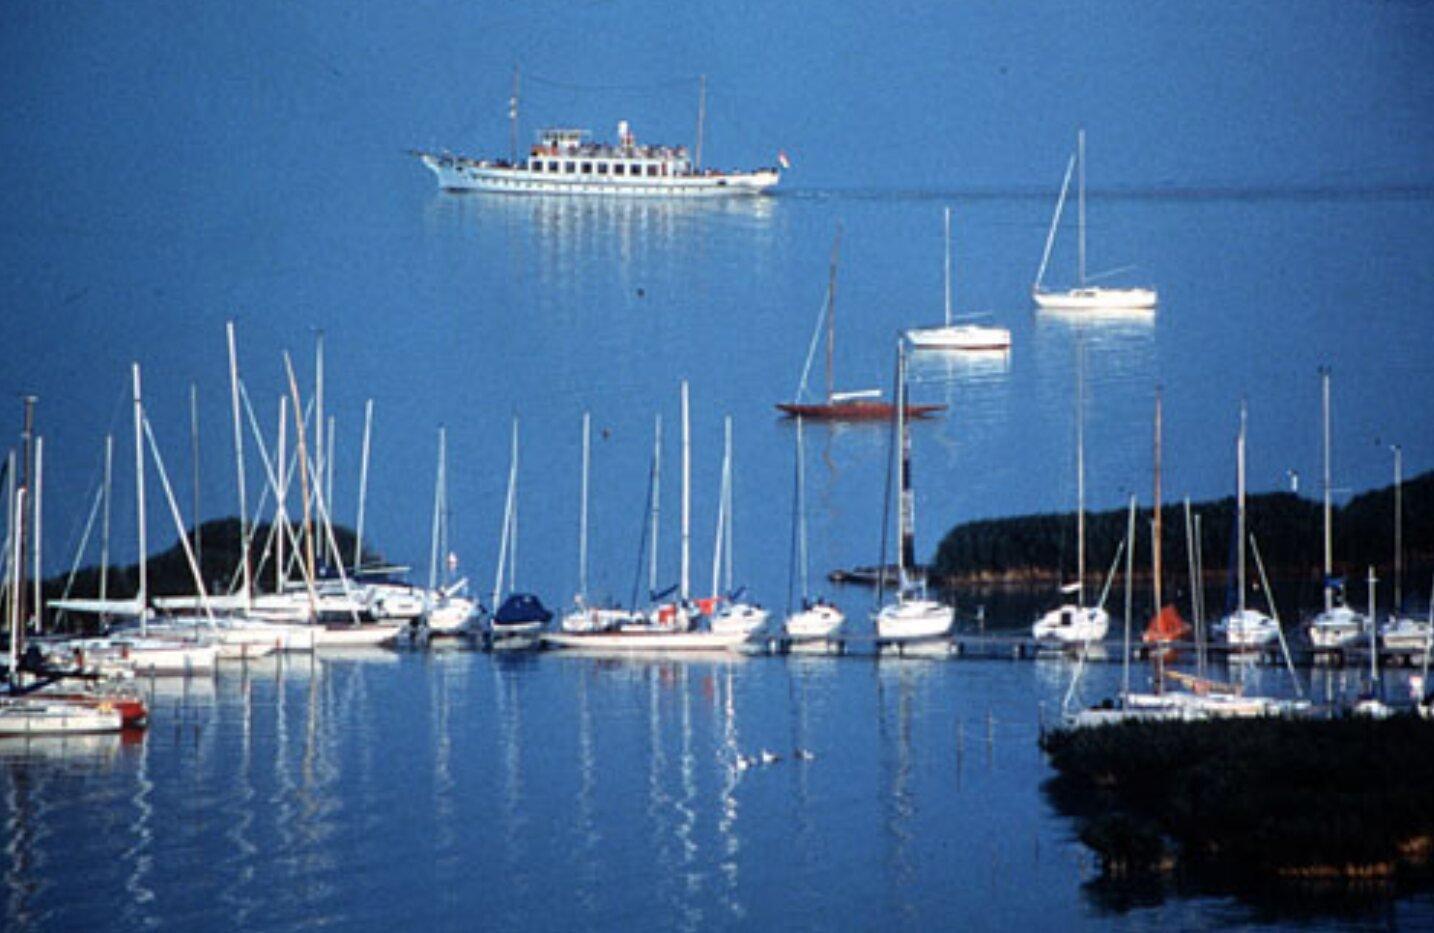 Однодневный VIP-тур вокруг озера Балатон: озеро Хевиз, Кестхей, Тихань, Балатонфюред